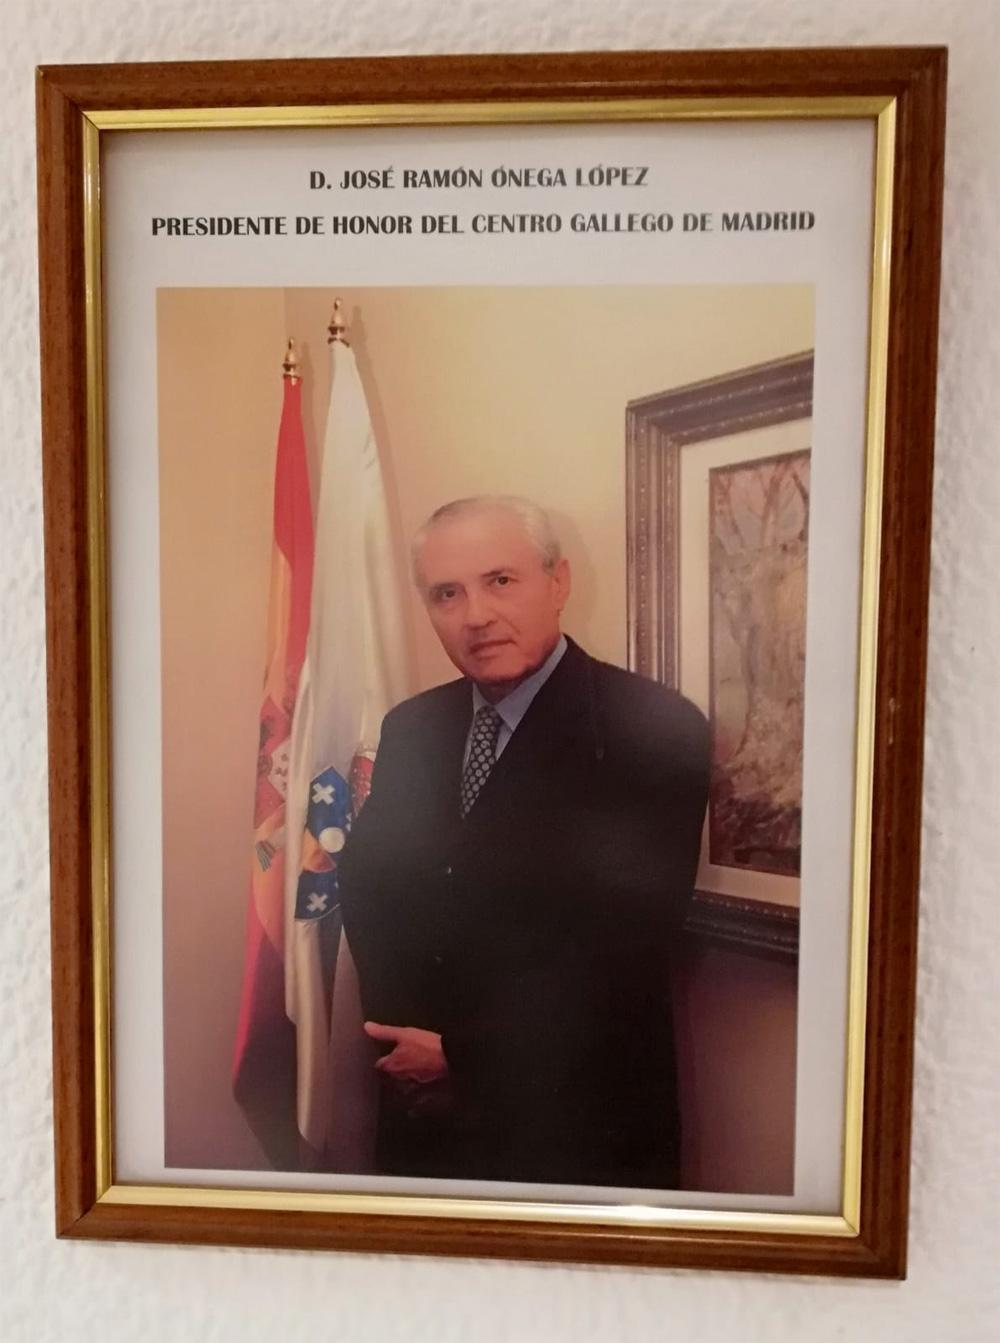 José Ramón Ónega López